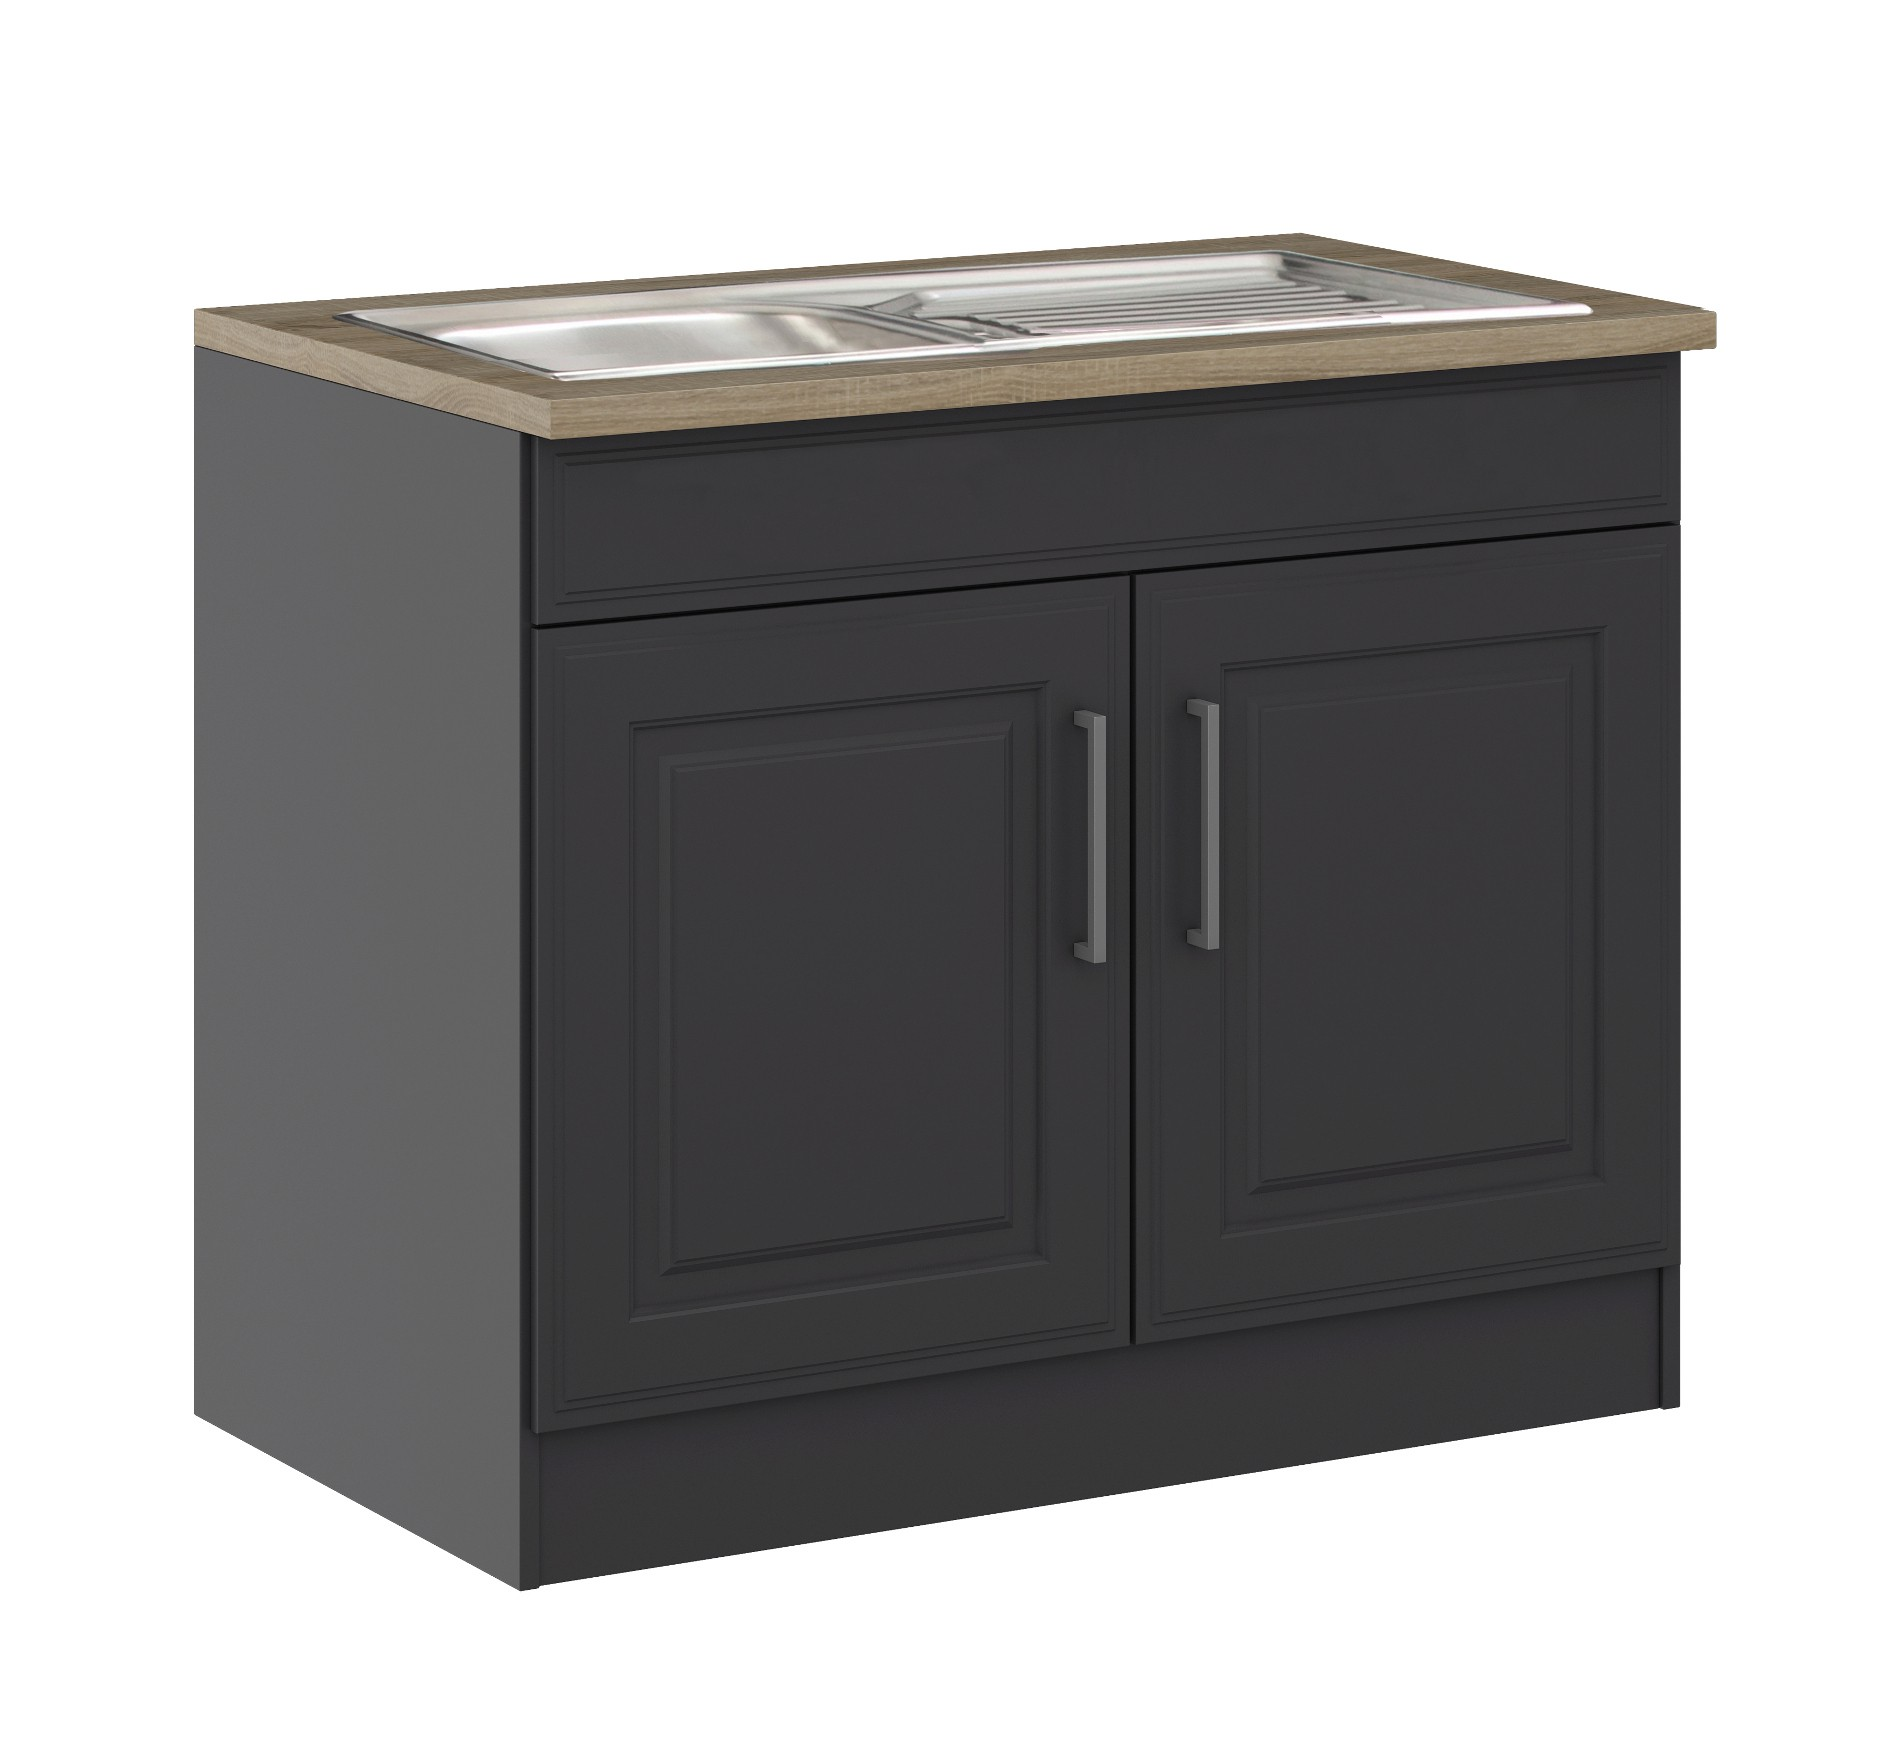 k chen sp lenschrank k ln 2 t rig 100 cm breit grau graphit k che sp lenschr nke. Black Bedroom Furniture Sets. Home Design Ideas